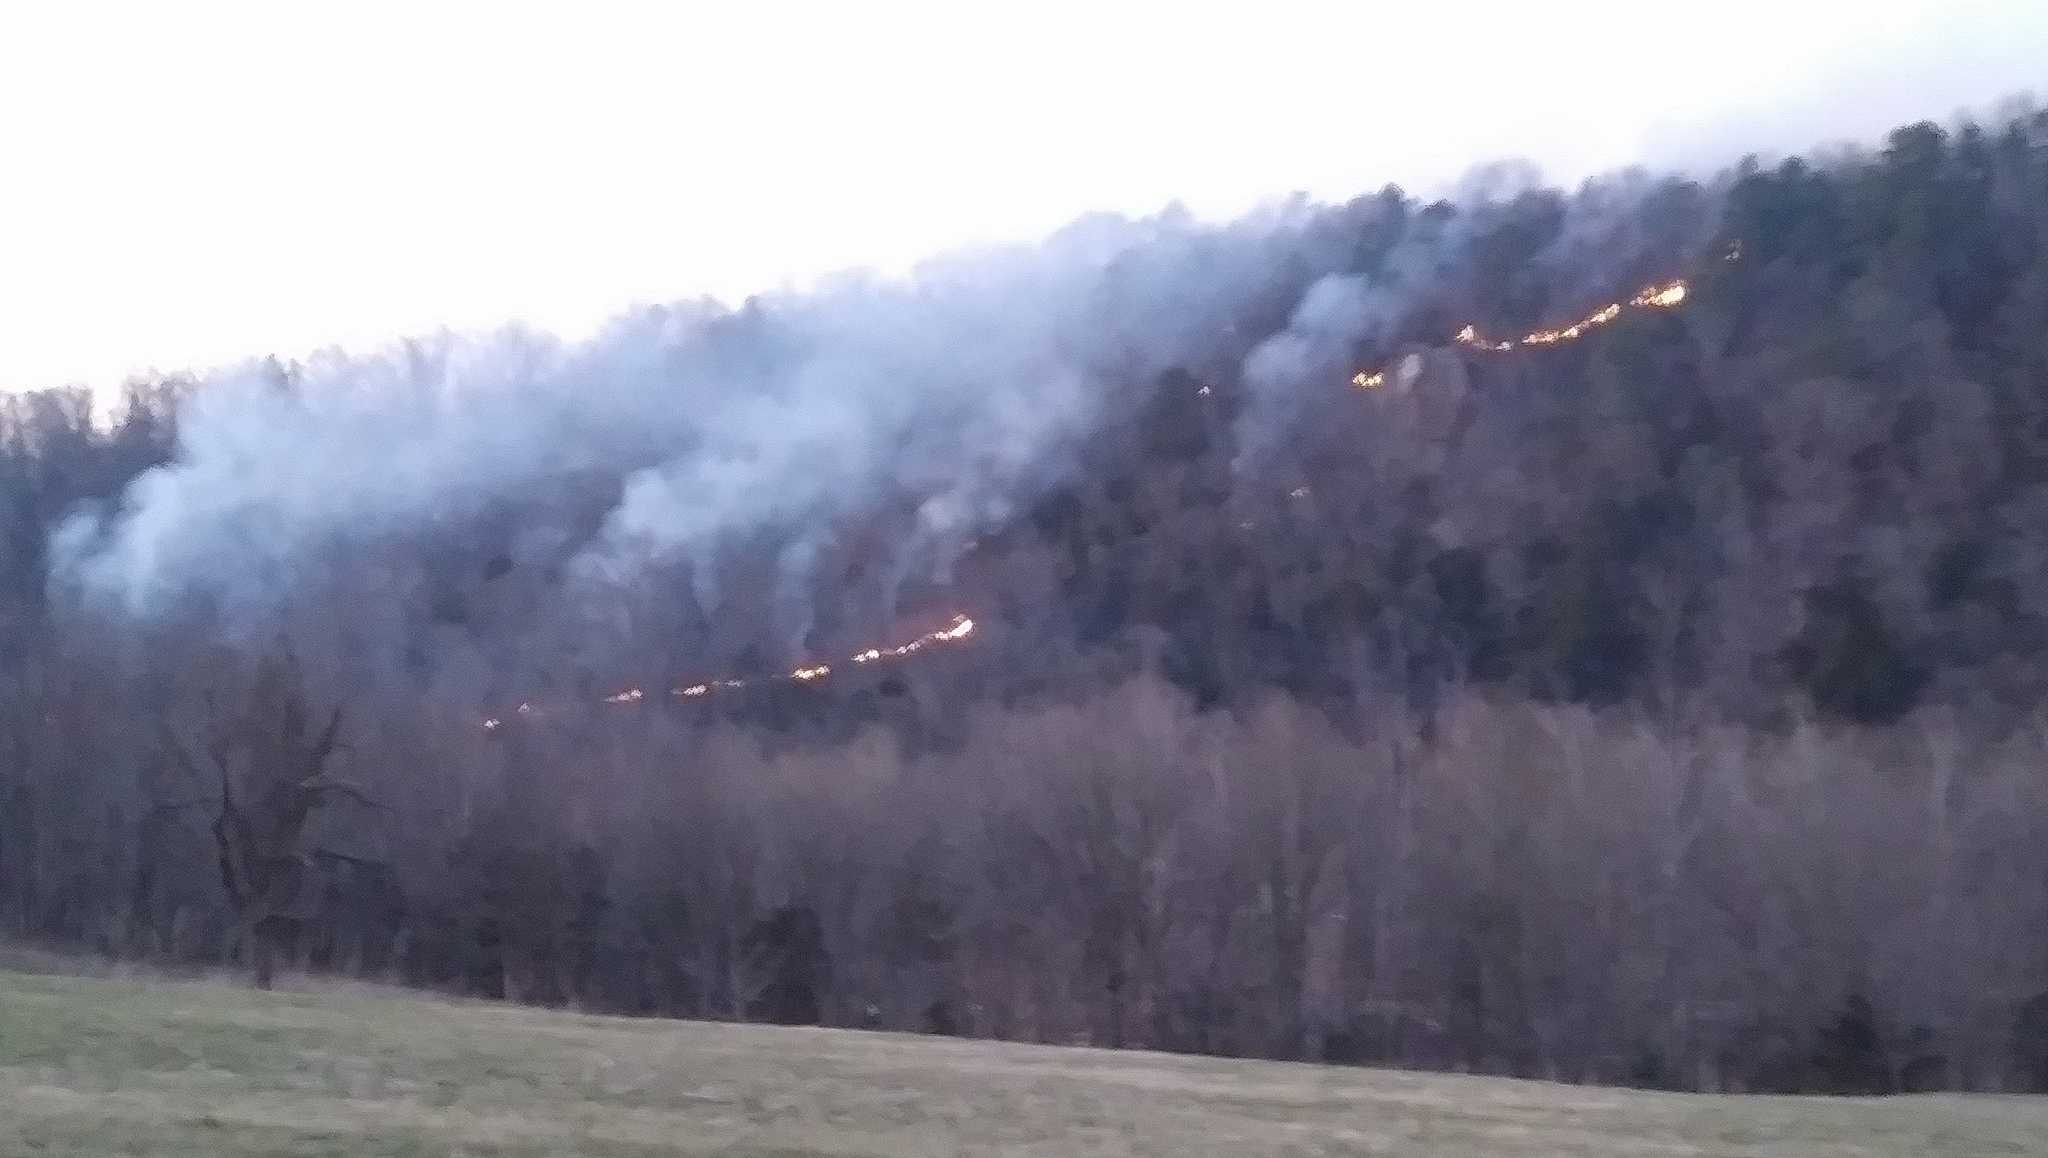 Fire crews are battling a large fire near Oak Grove not far fromthe Arkansas-Missouri border in Carroll County.